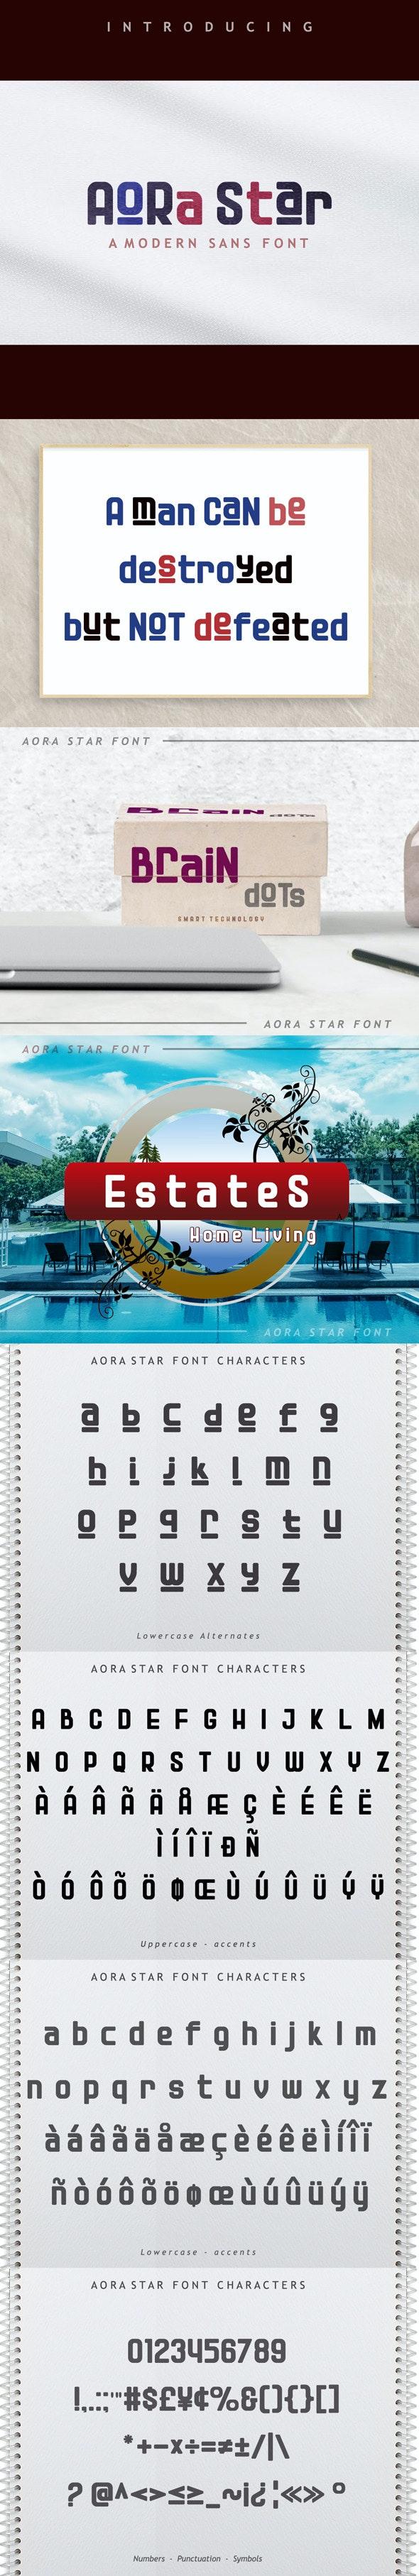 Aora star Font - Sans-Serif Fonts